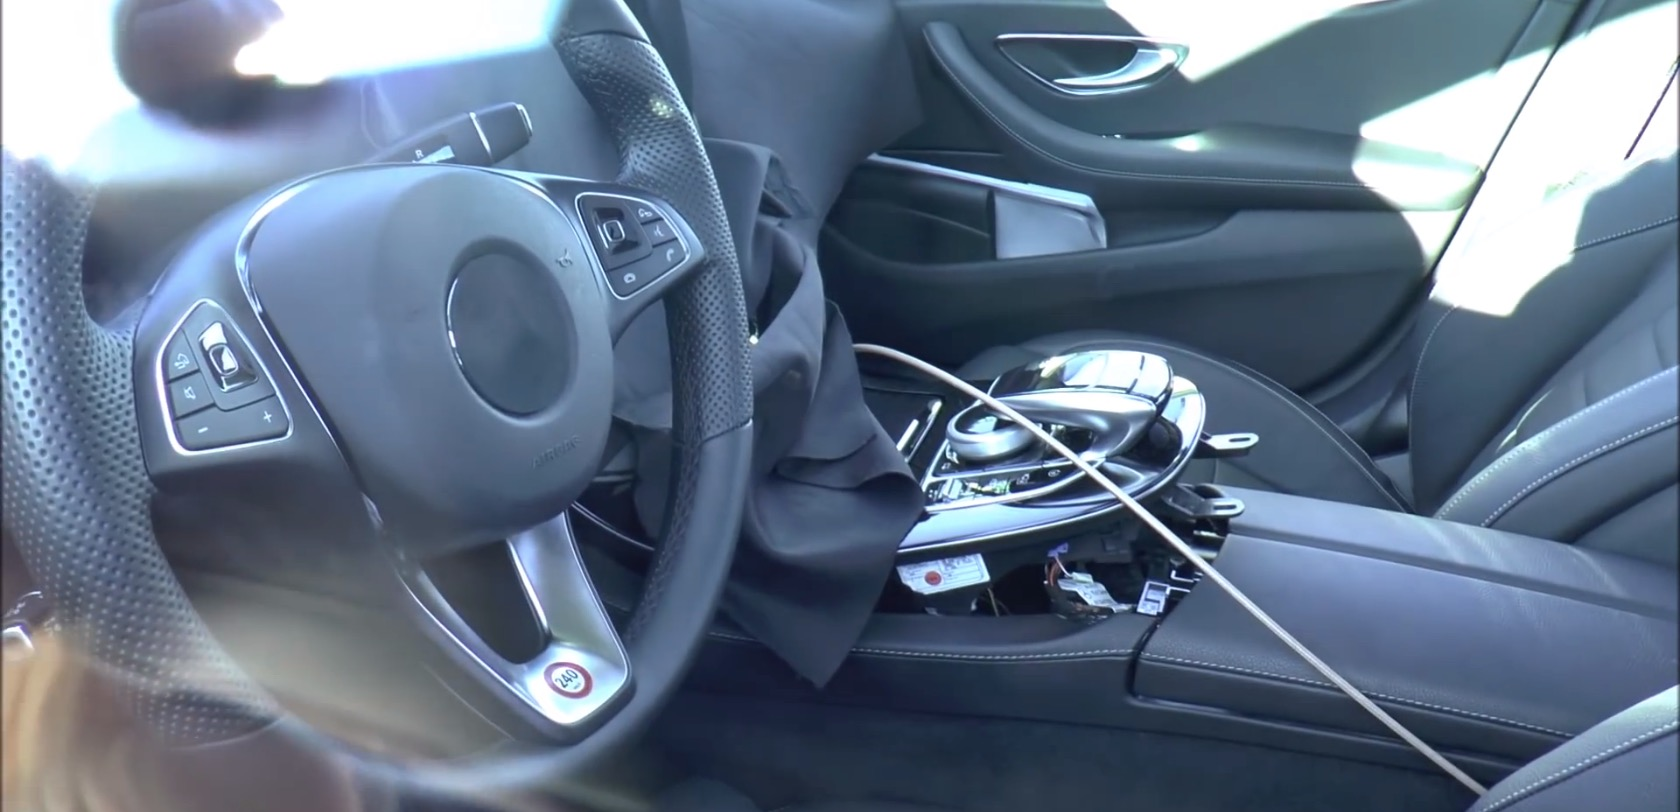 2017 Mercedes Benz E Class Prototype Interior Filmed In Great Detail Autoevolution